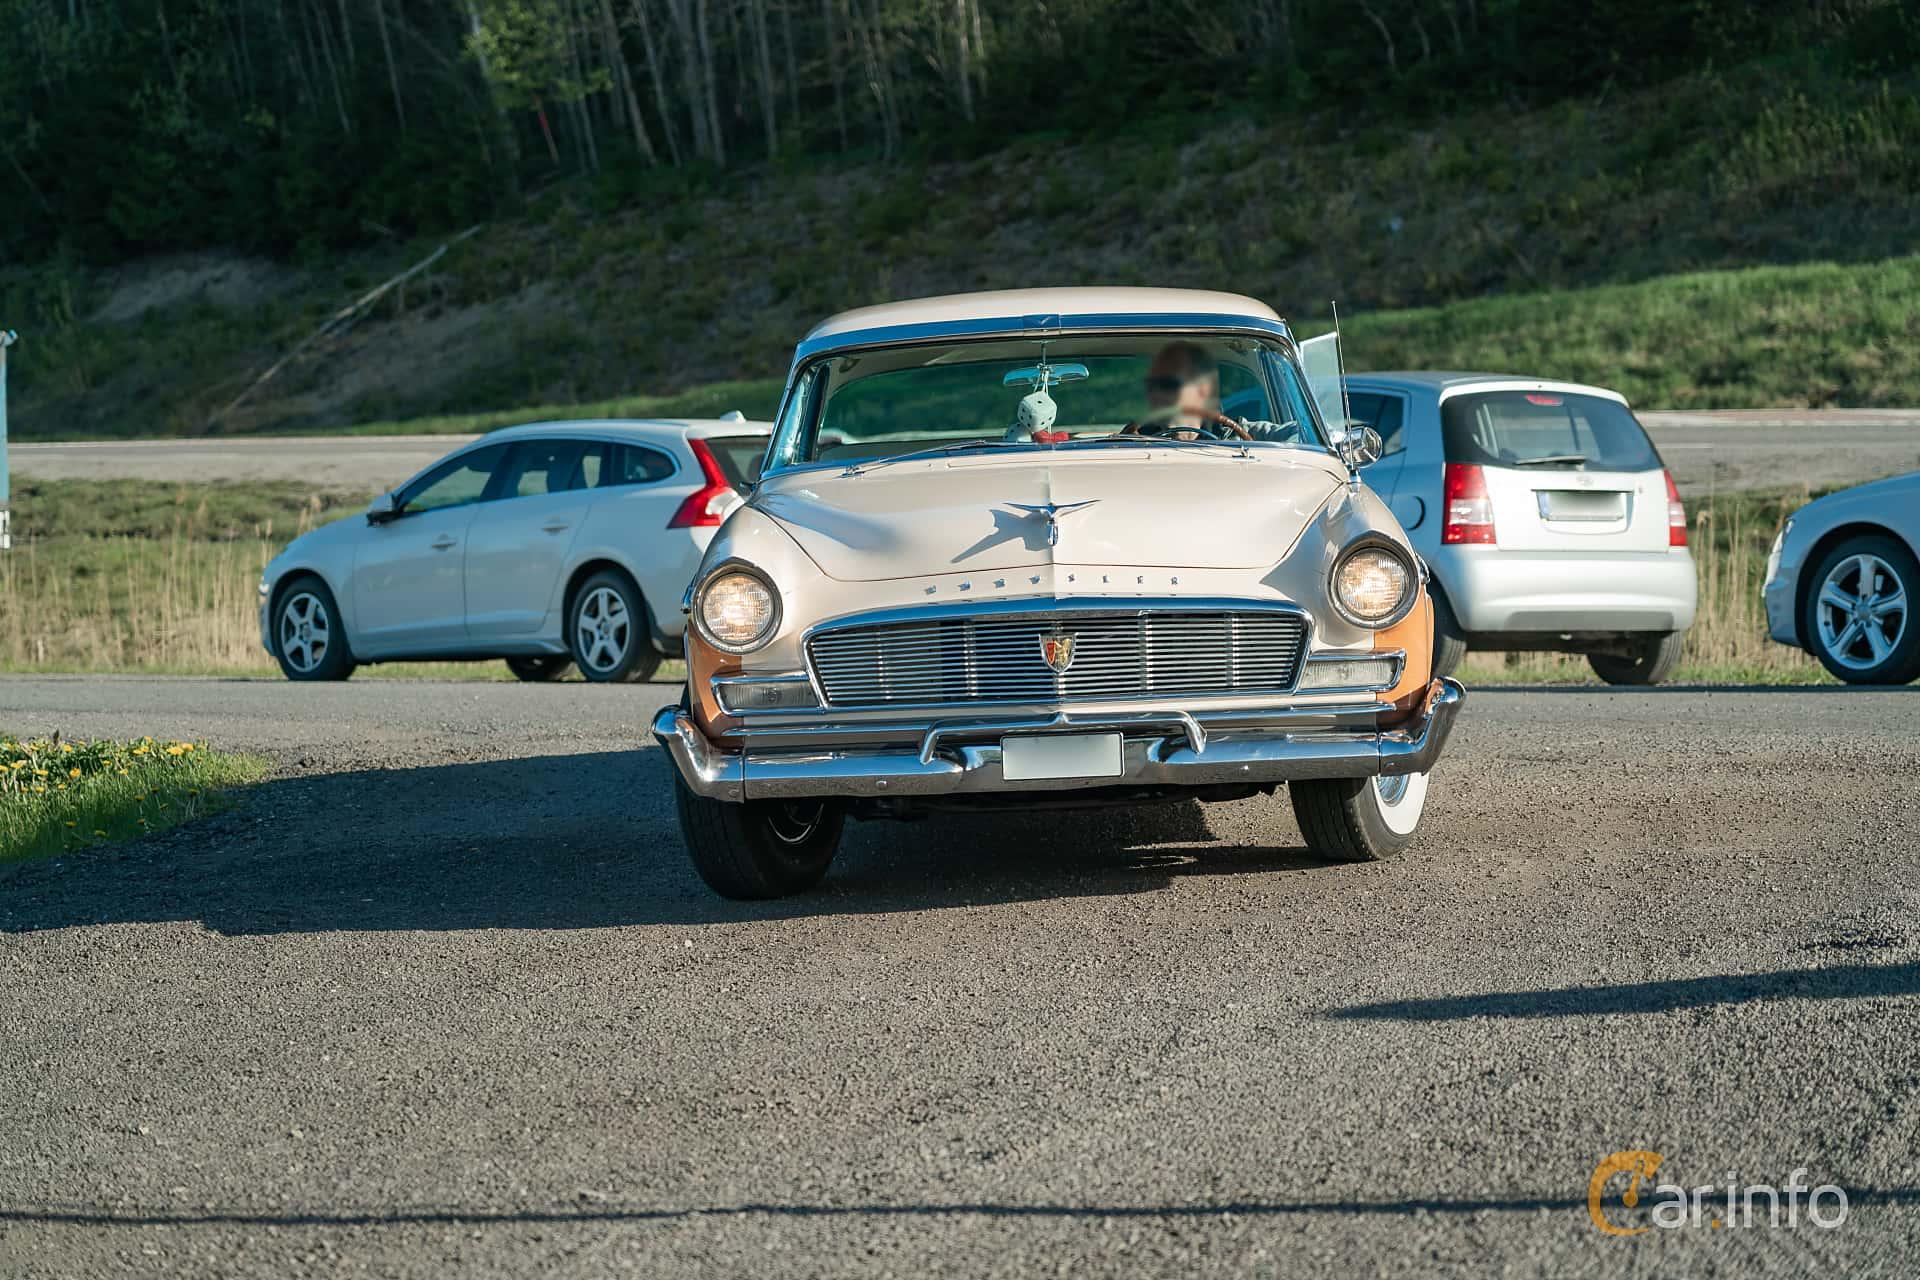 Chrysler New Yorker Newport 4-door 5.8 V8 PowerFlite, 284hp, 1956 at Lissma Classic Car 2019 vecka 20